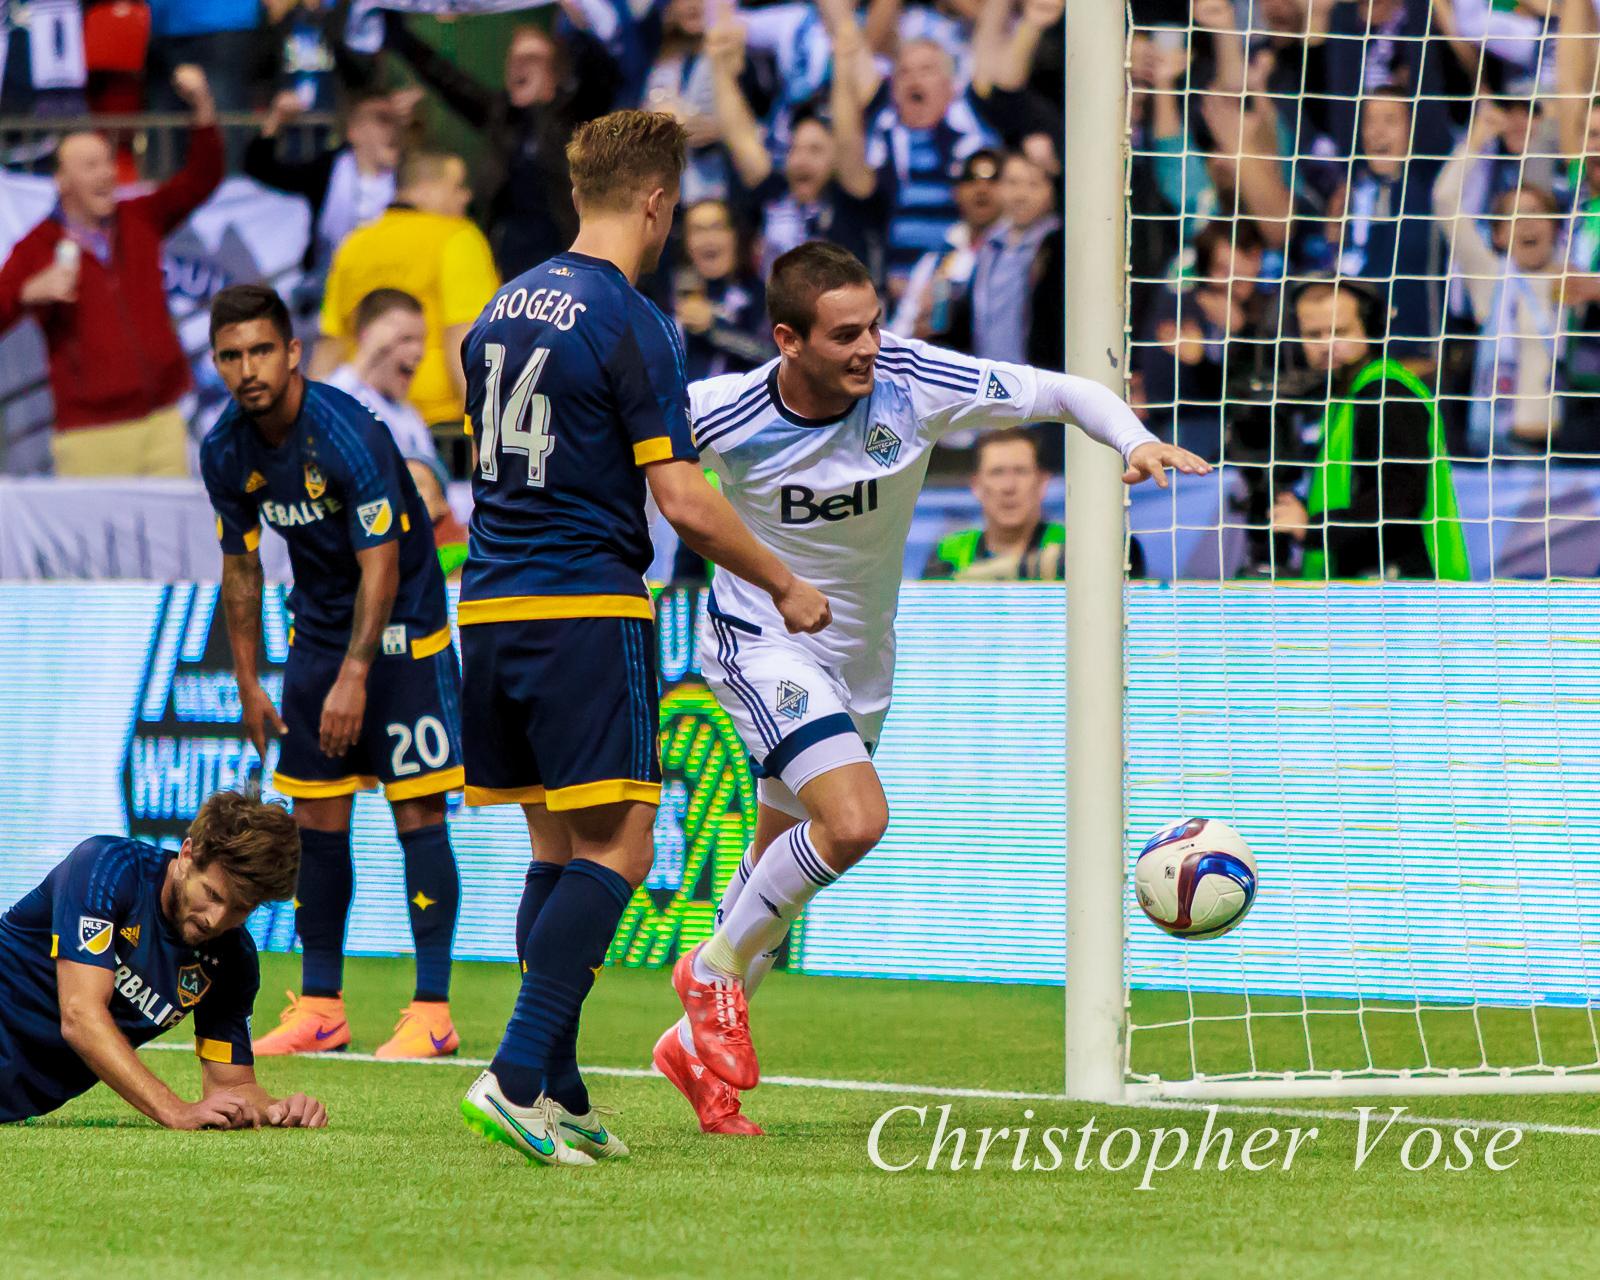 2015-04-04 Octavio Rivero Goal Celebration 1.jpg